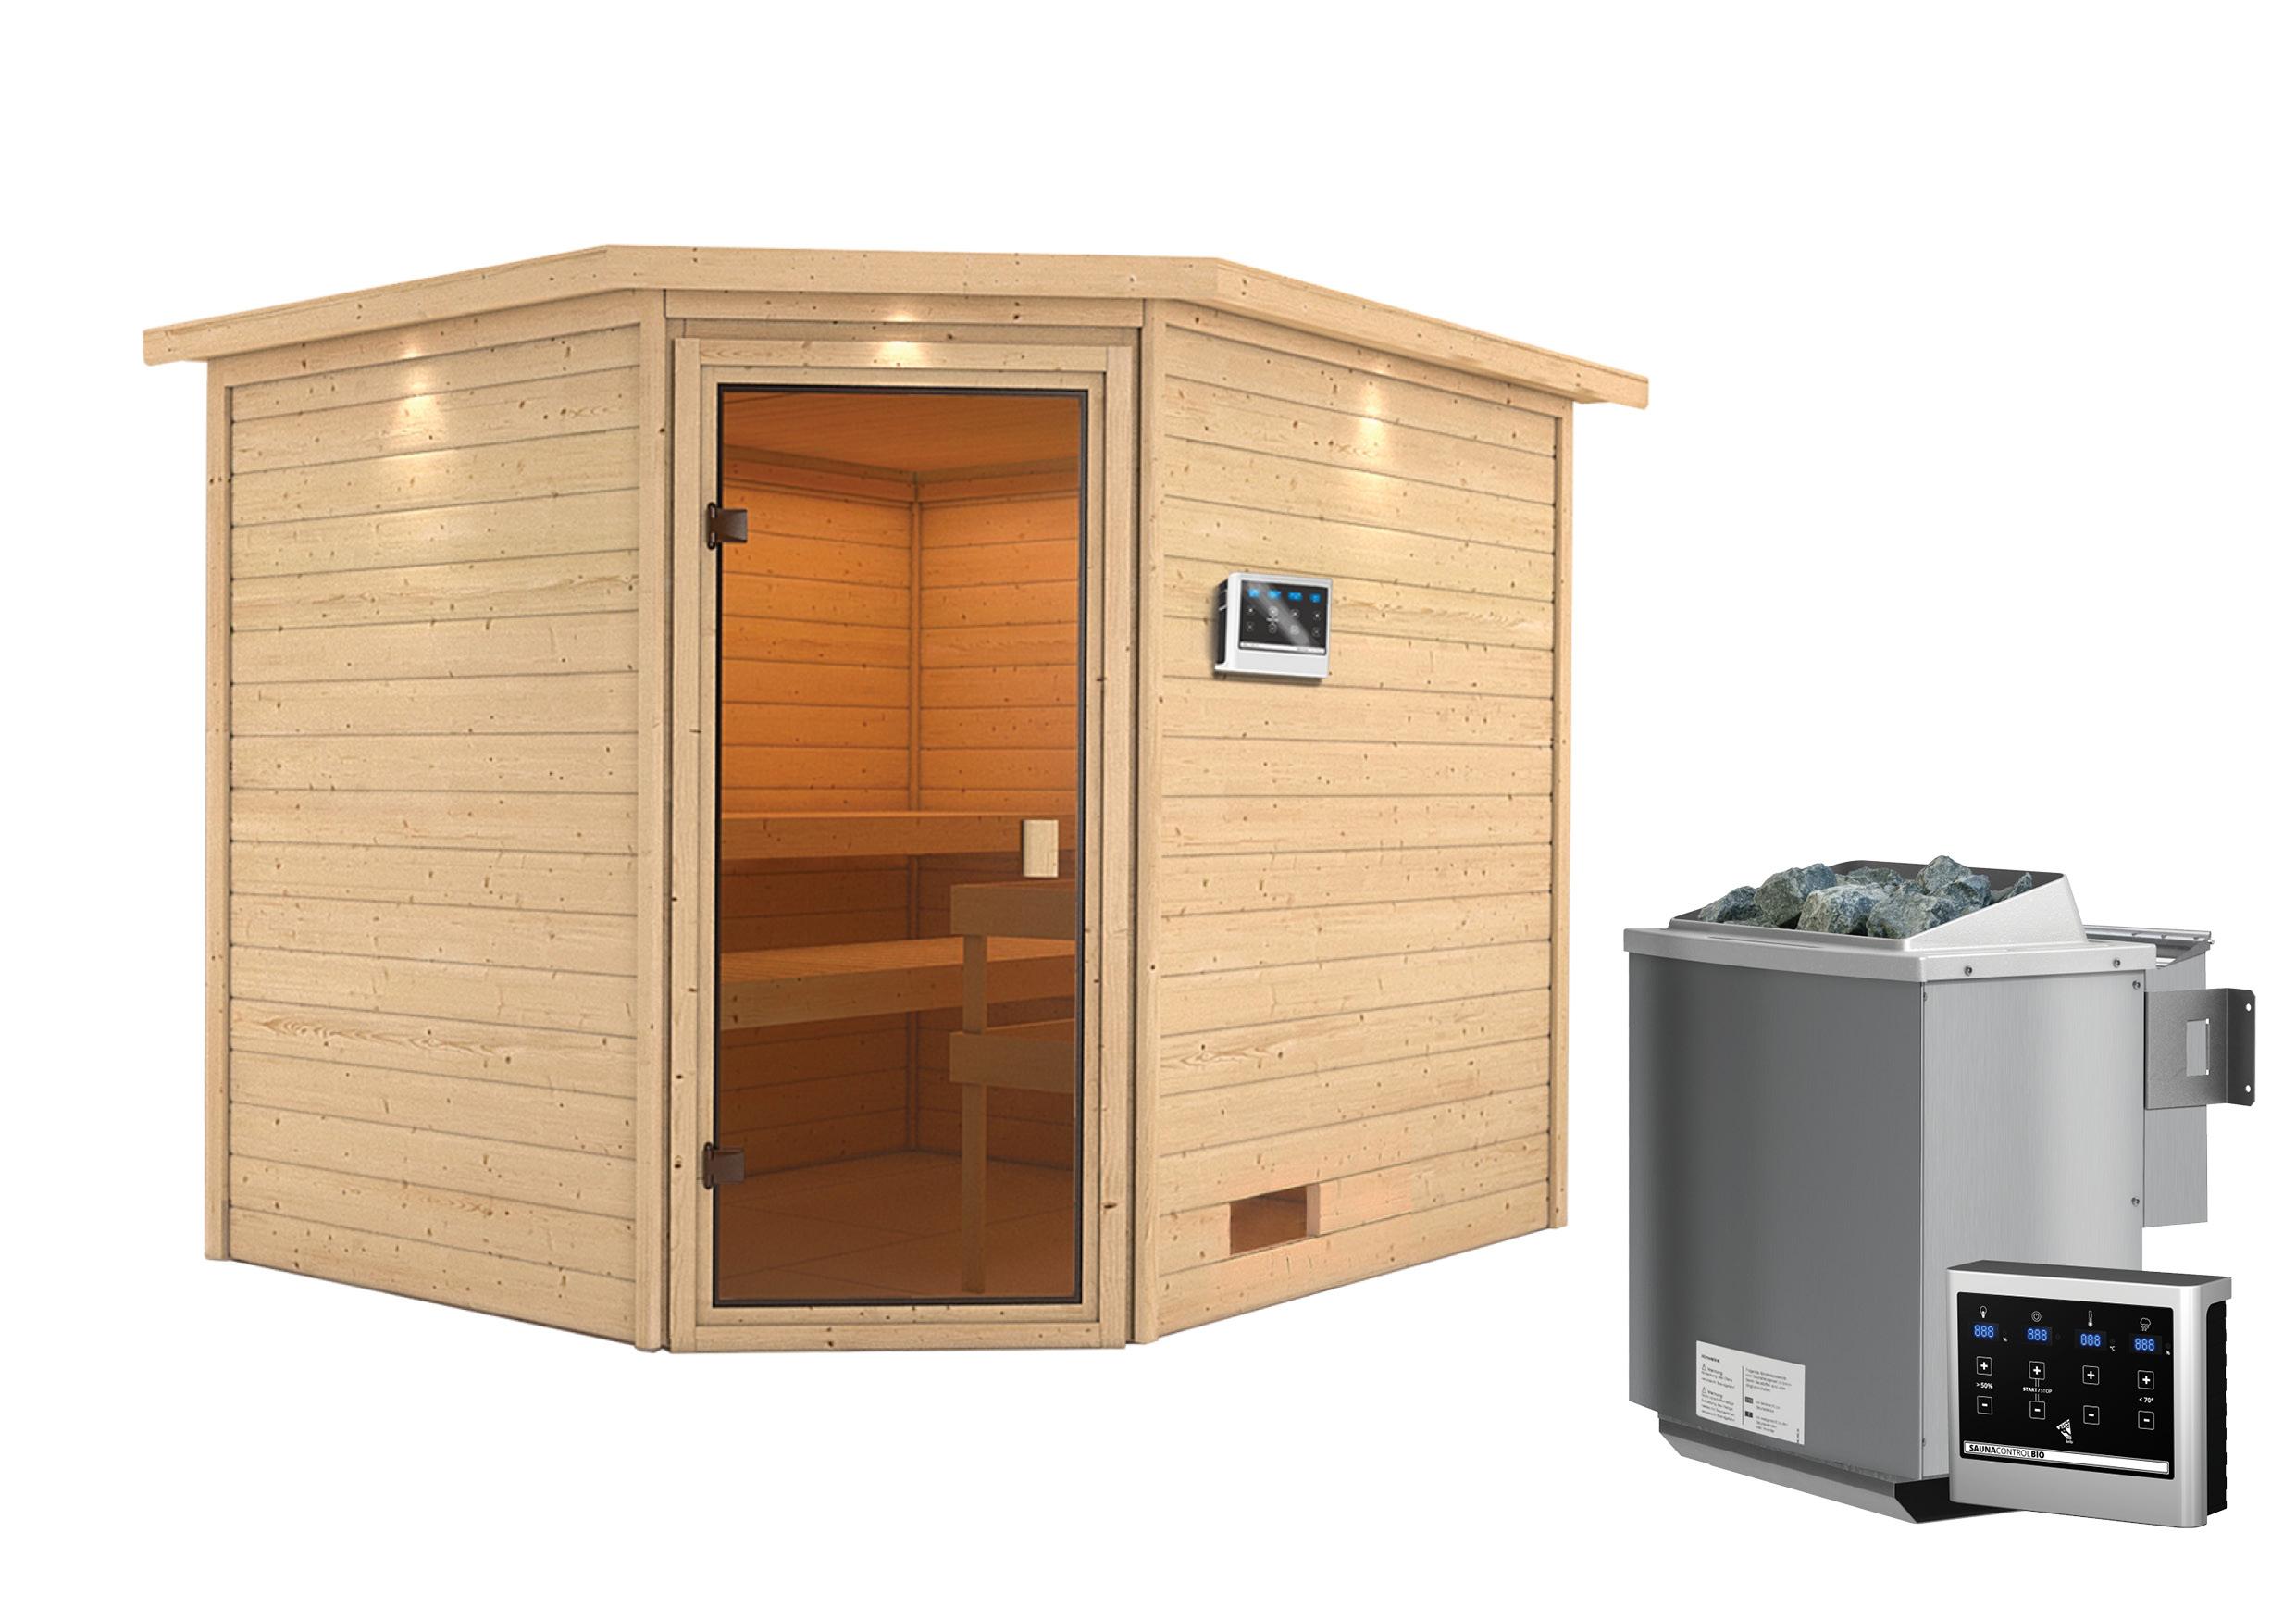 Woodfeeling Sauna Lotta 38mm Dachkranz Bio Saunaofen 9 kW extern Bild 12